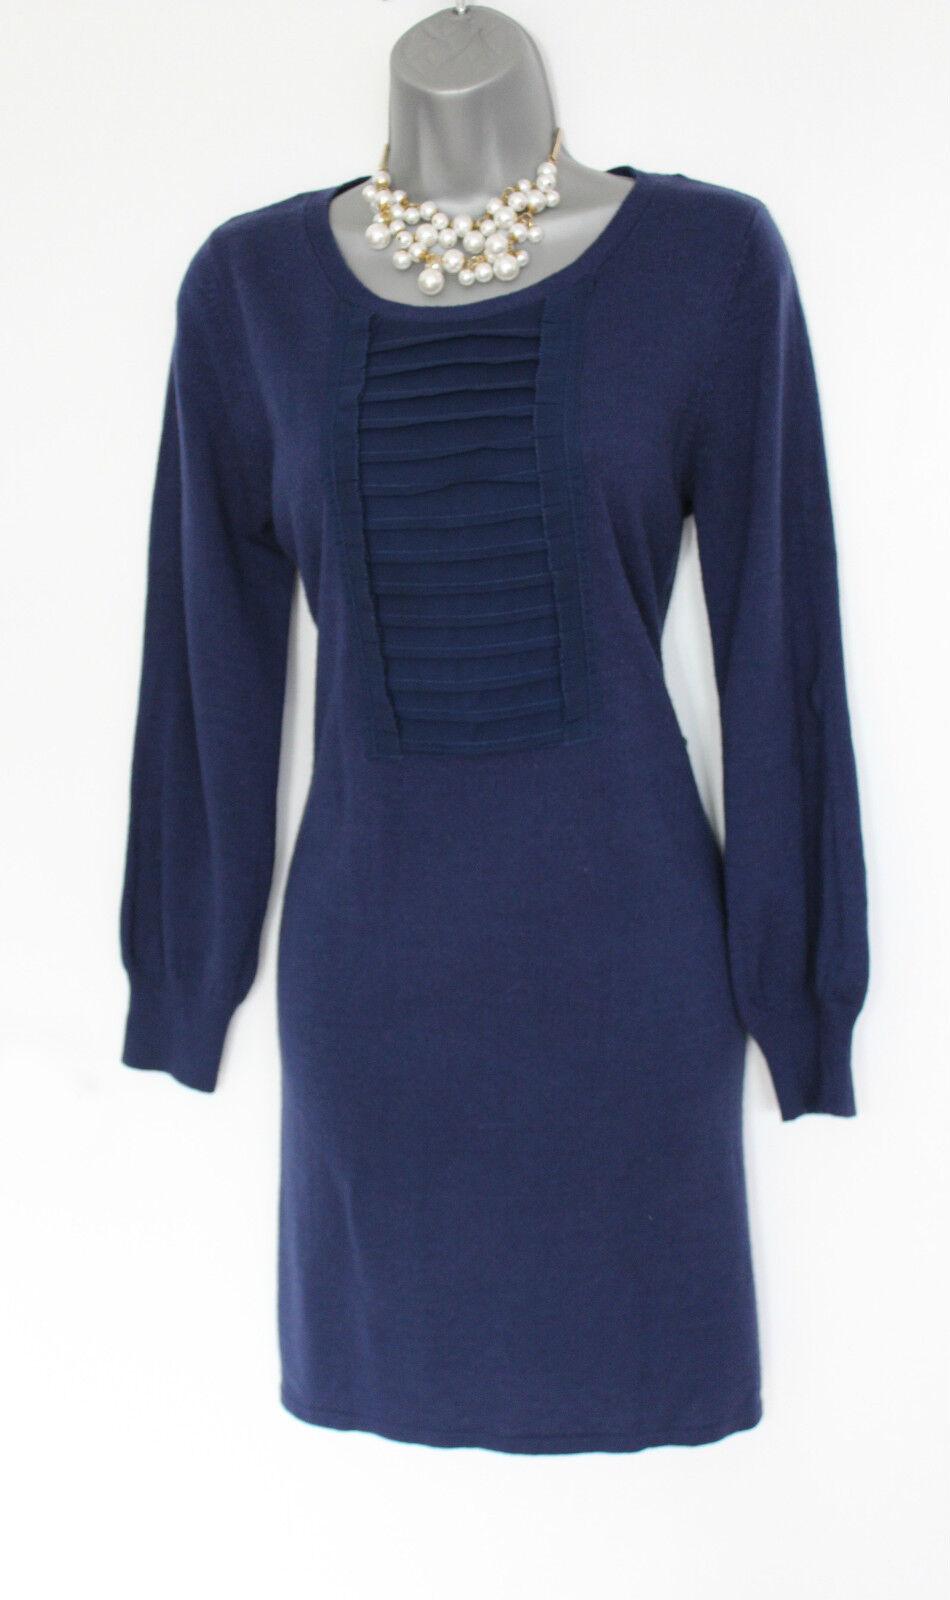 MONSOON Navy Wool Blend Long Sleeves Comfortable Casual Winter Tunic Dress  M